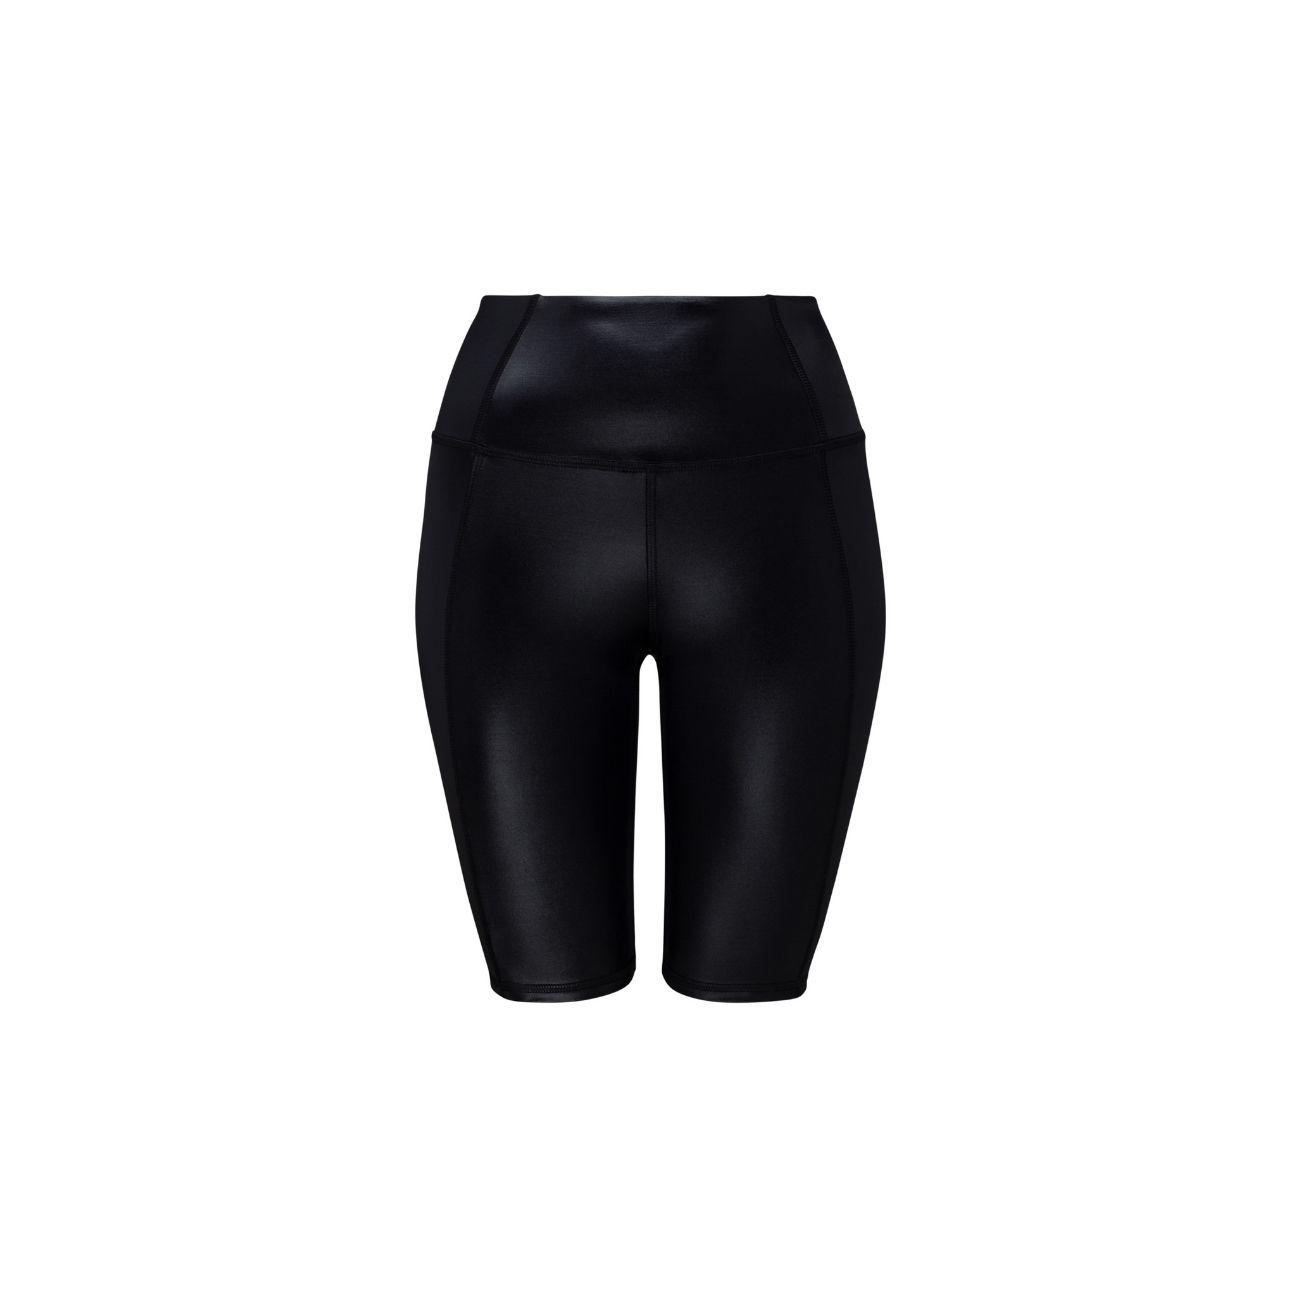 Sport Angel women's madrid cycle shorts